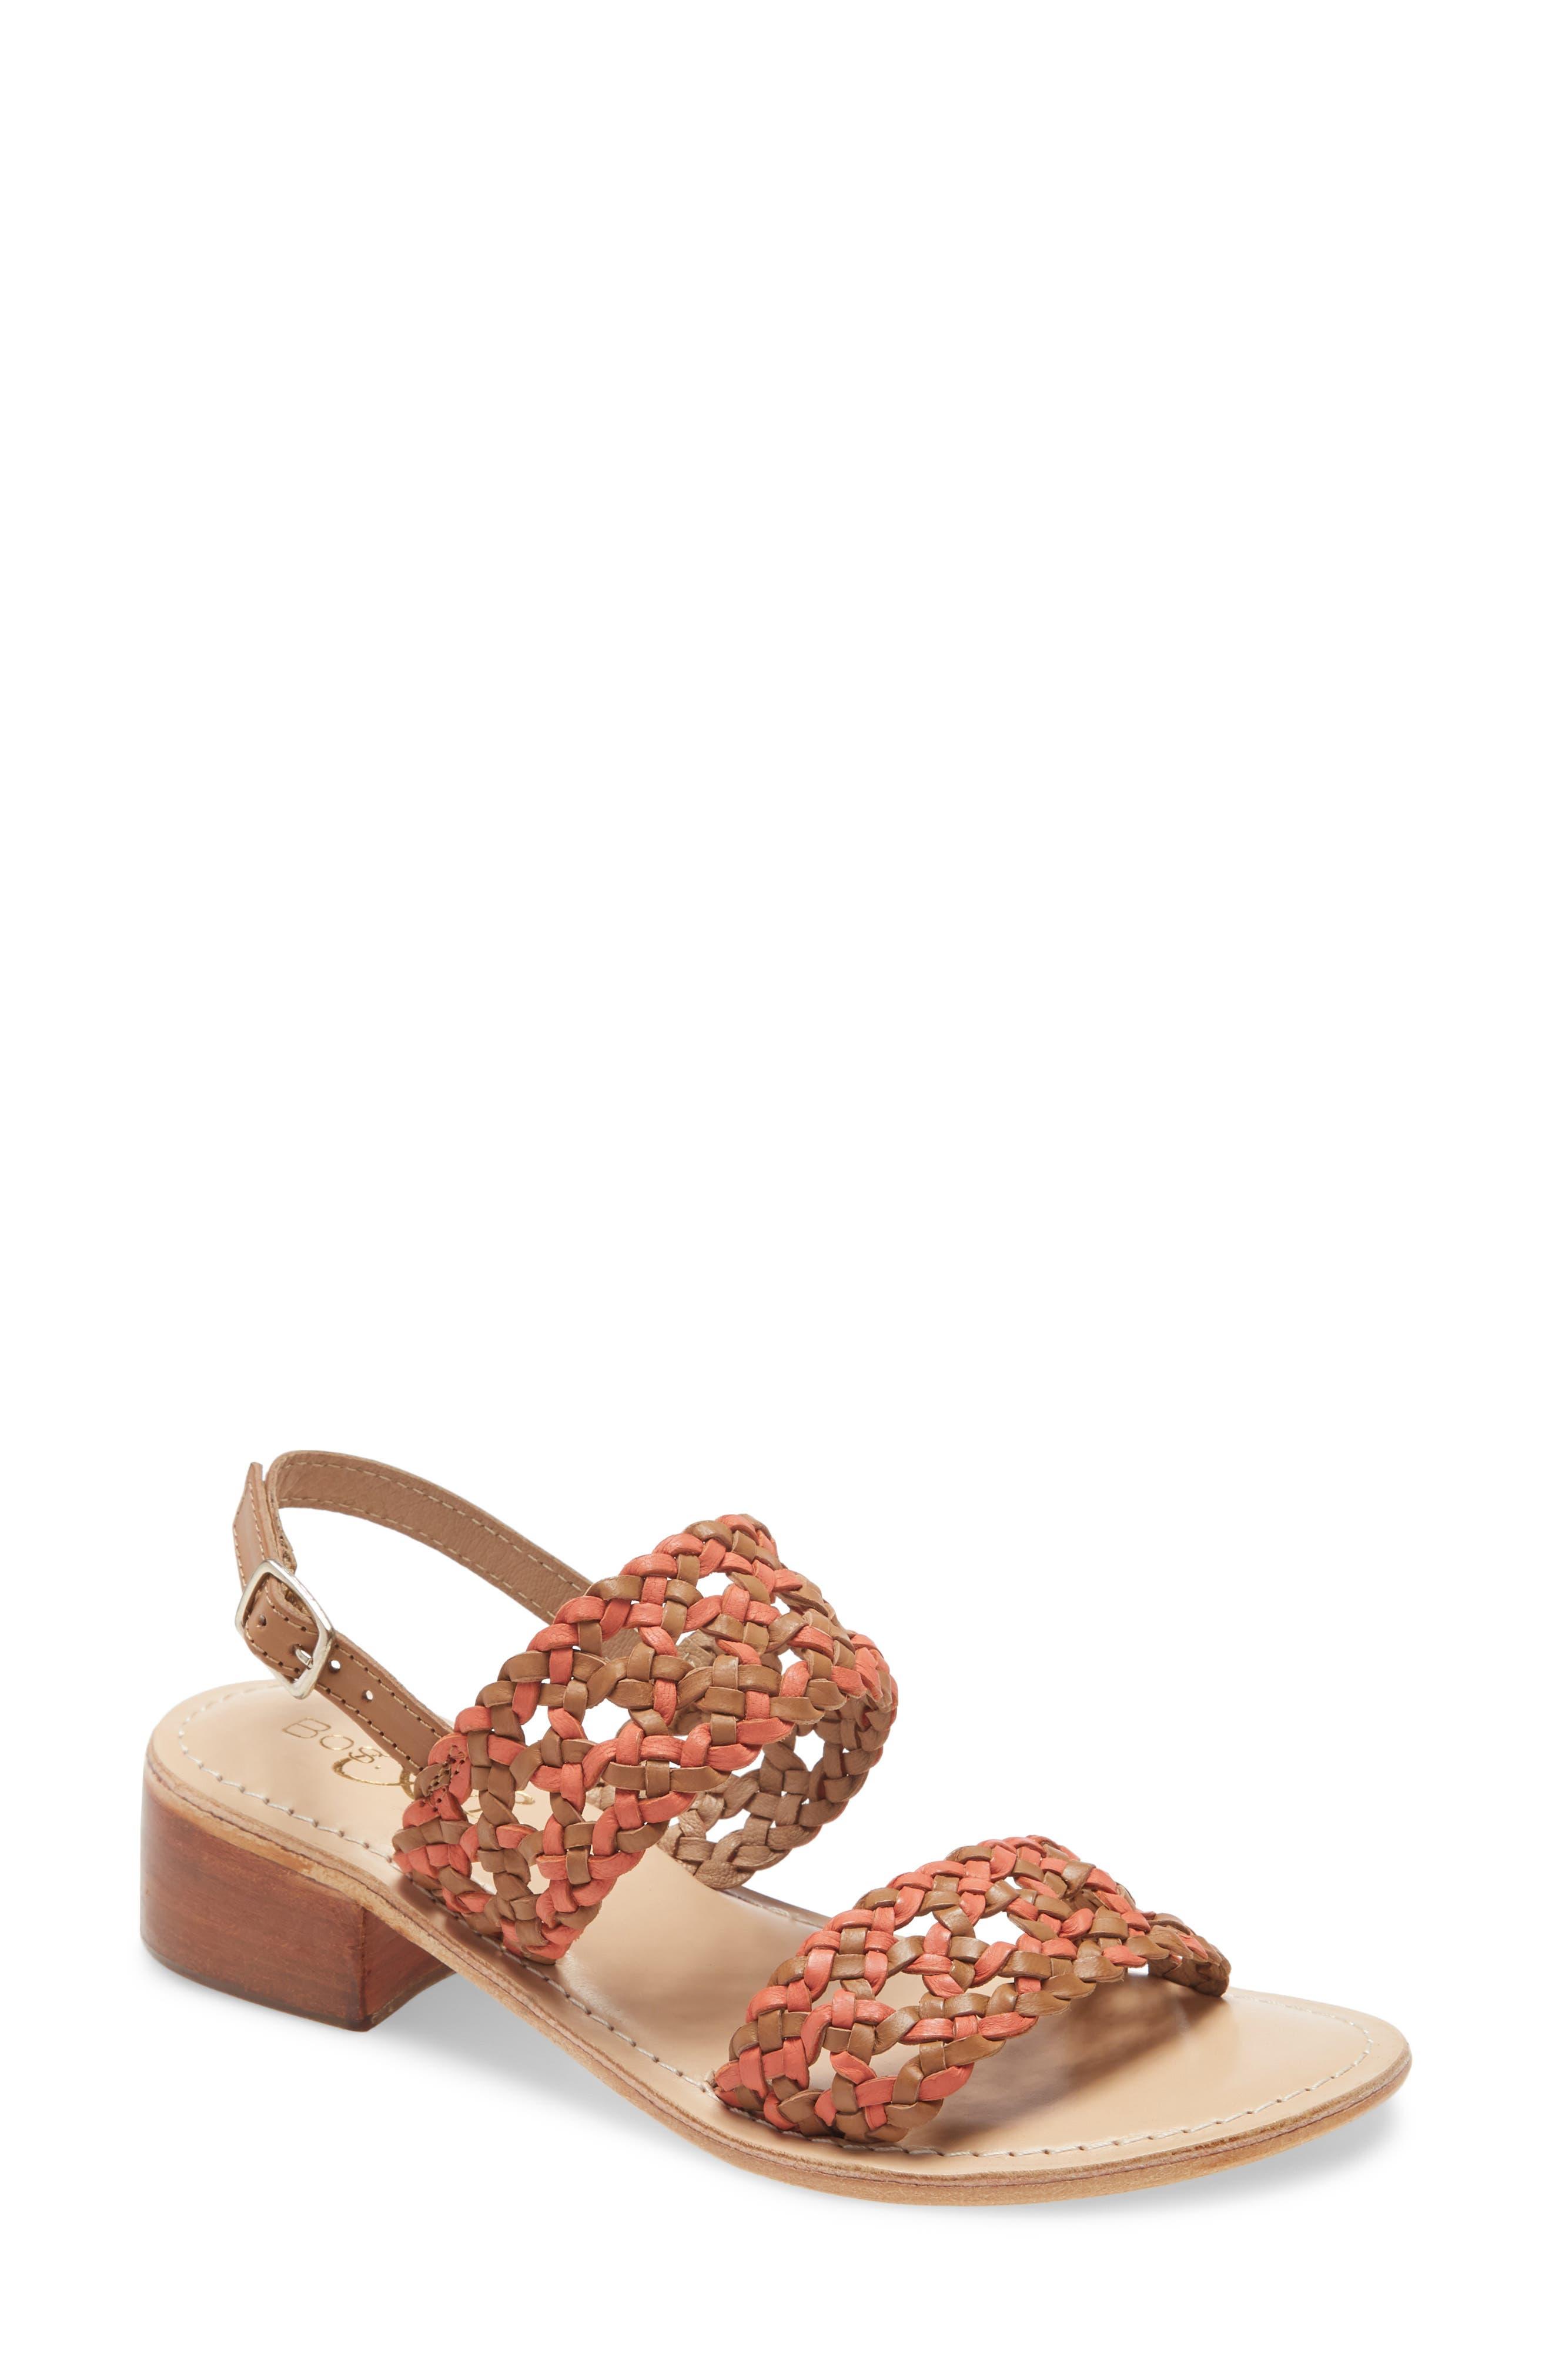 Iyla Slingback Sandal